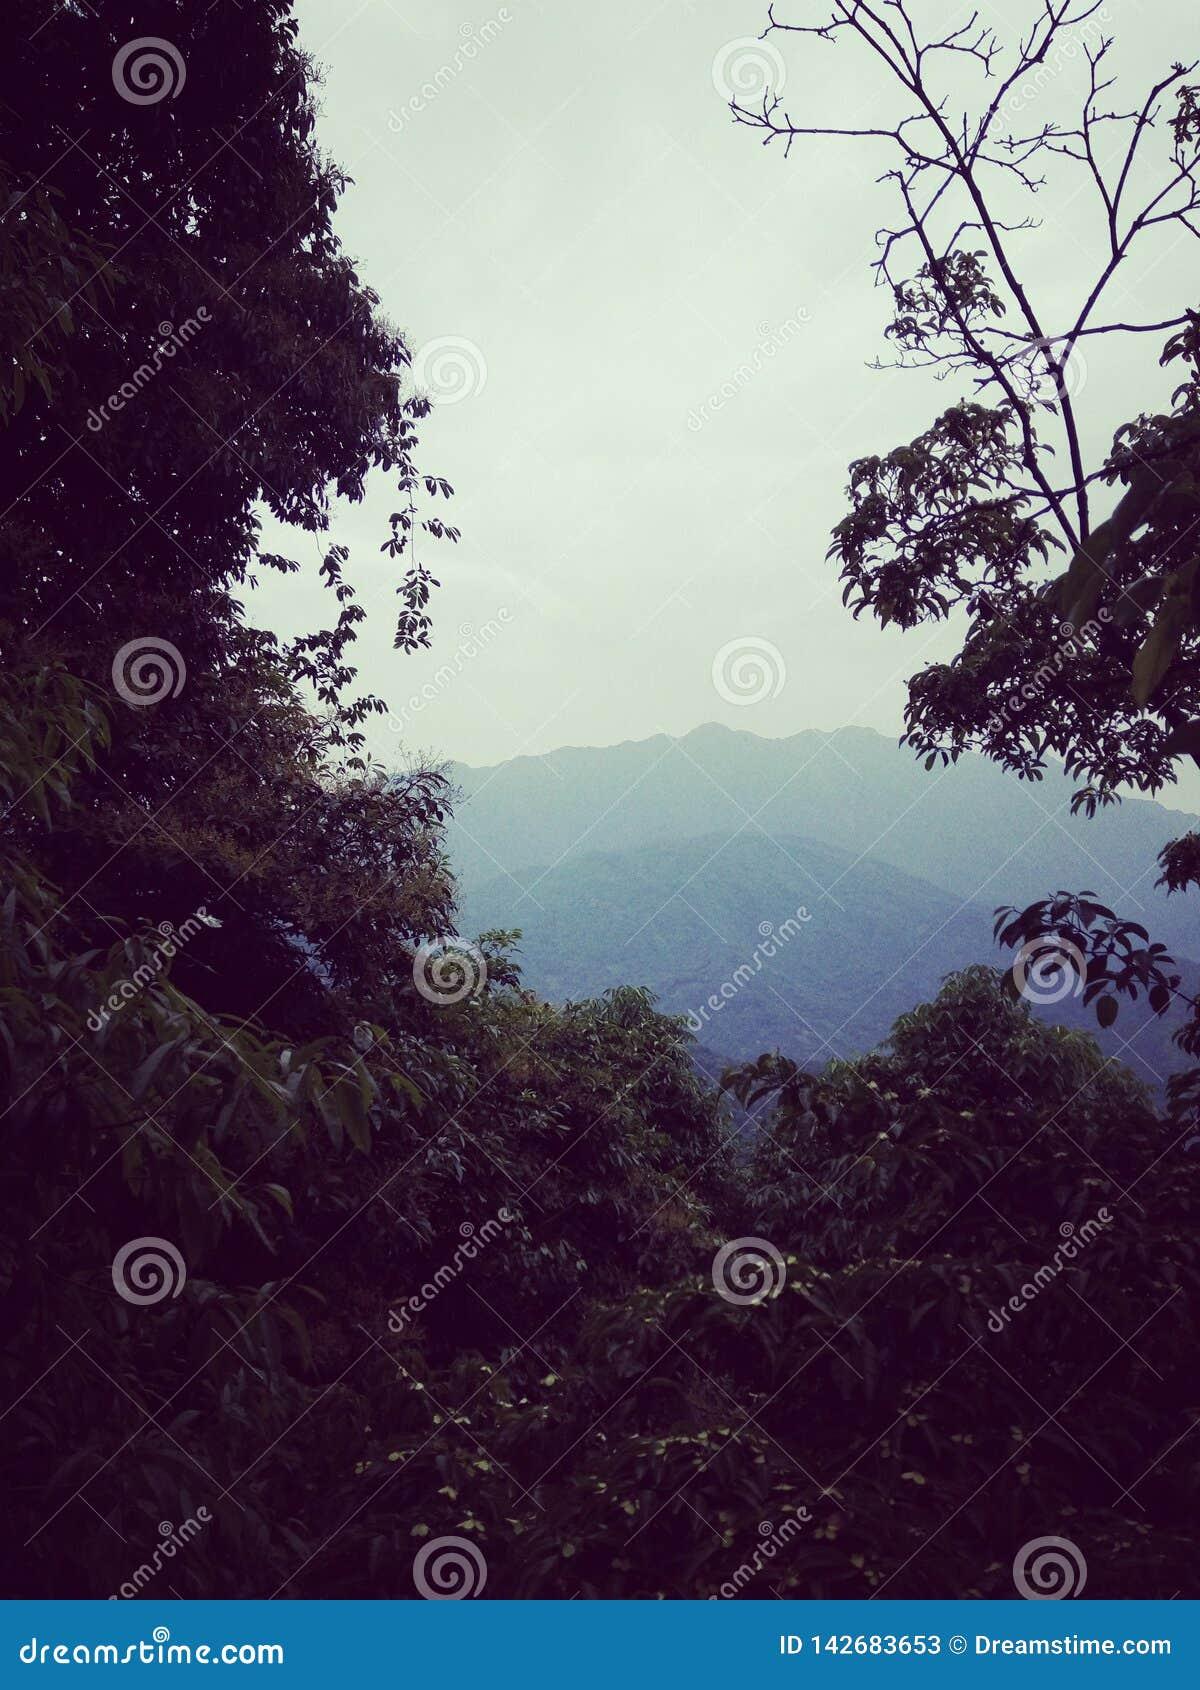 Attrazioni, montagna del qingcheng di Chengdu - della Cina